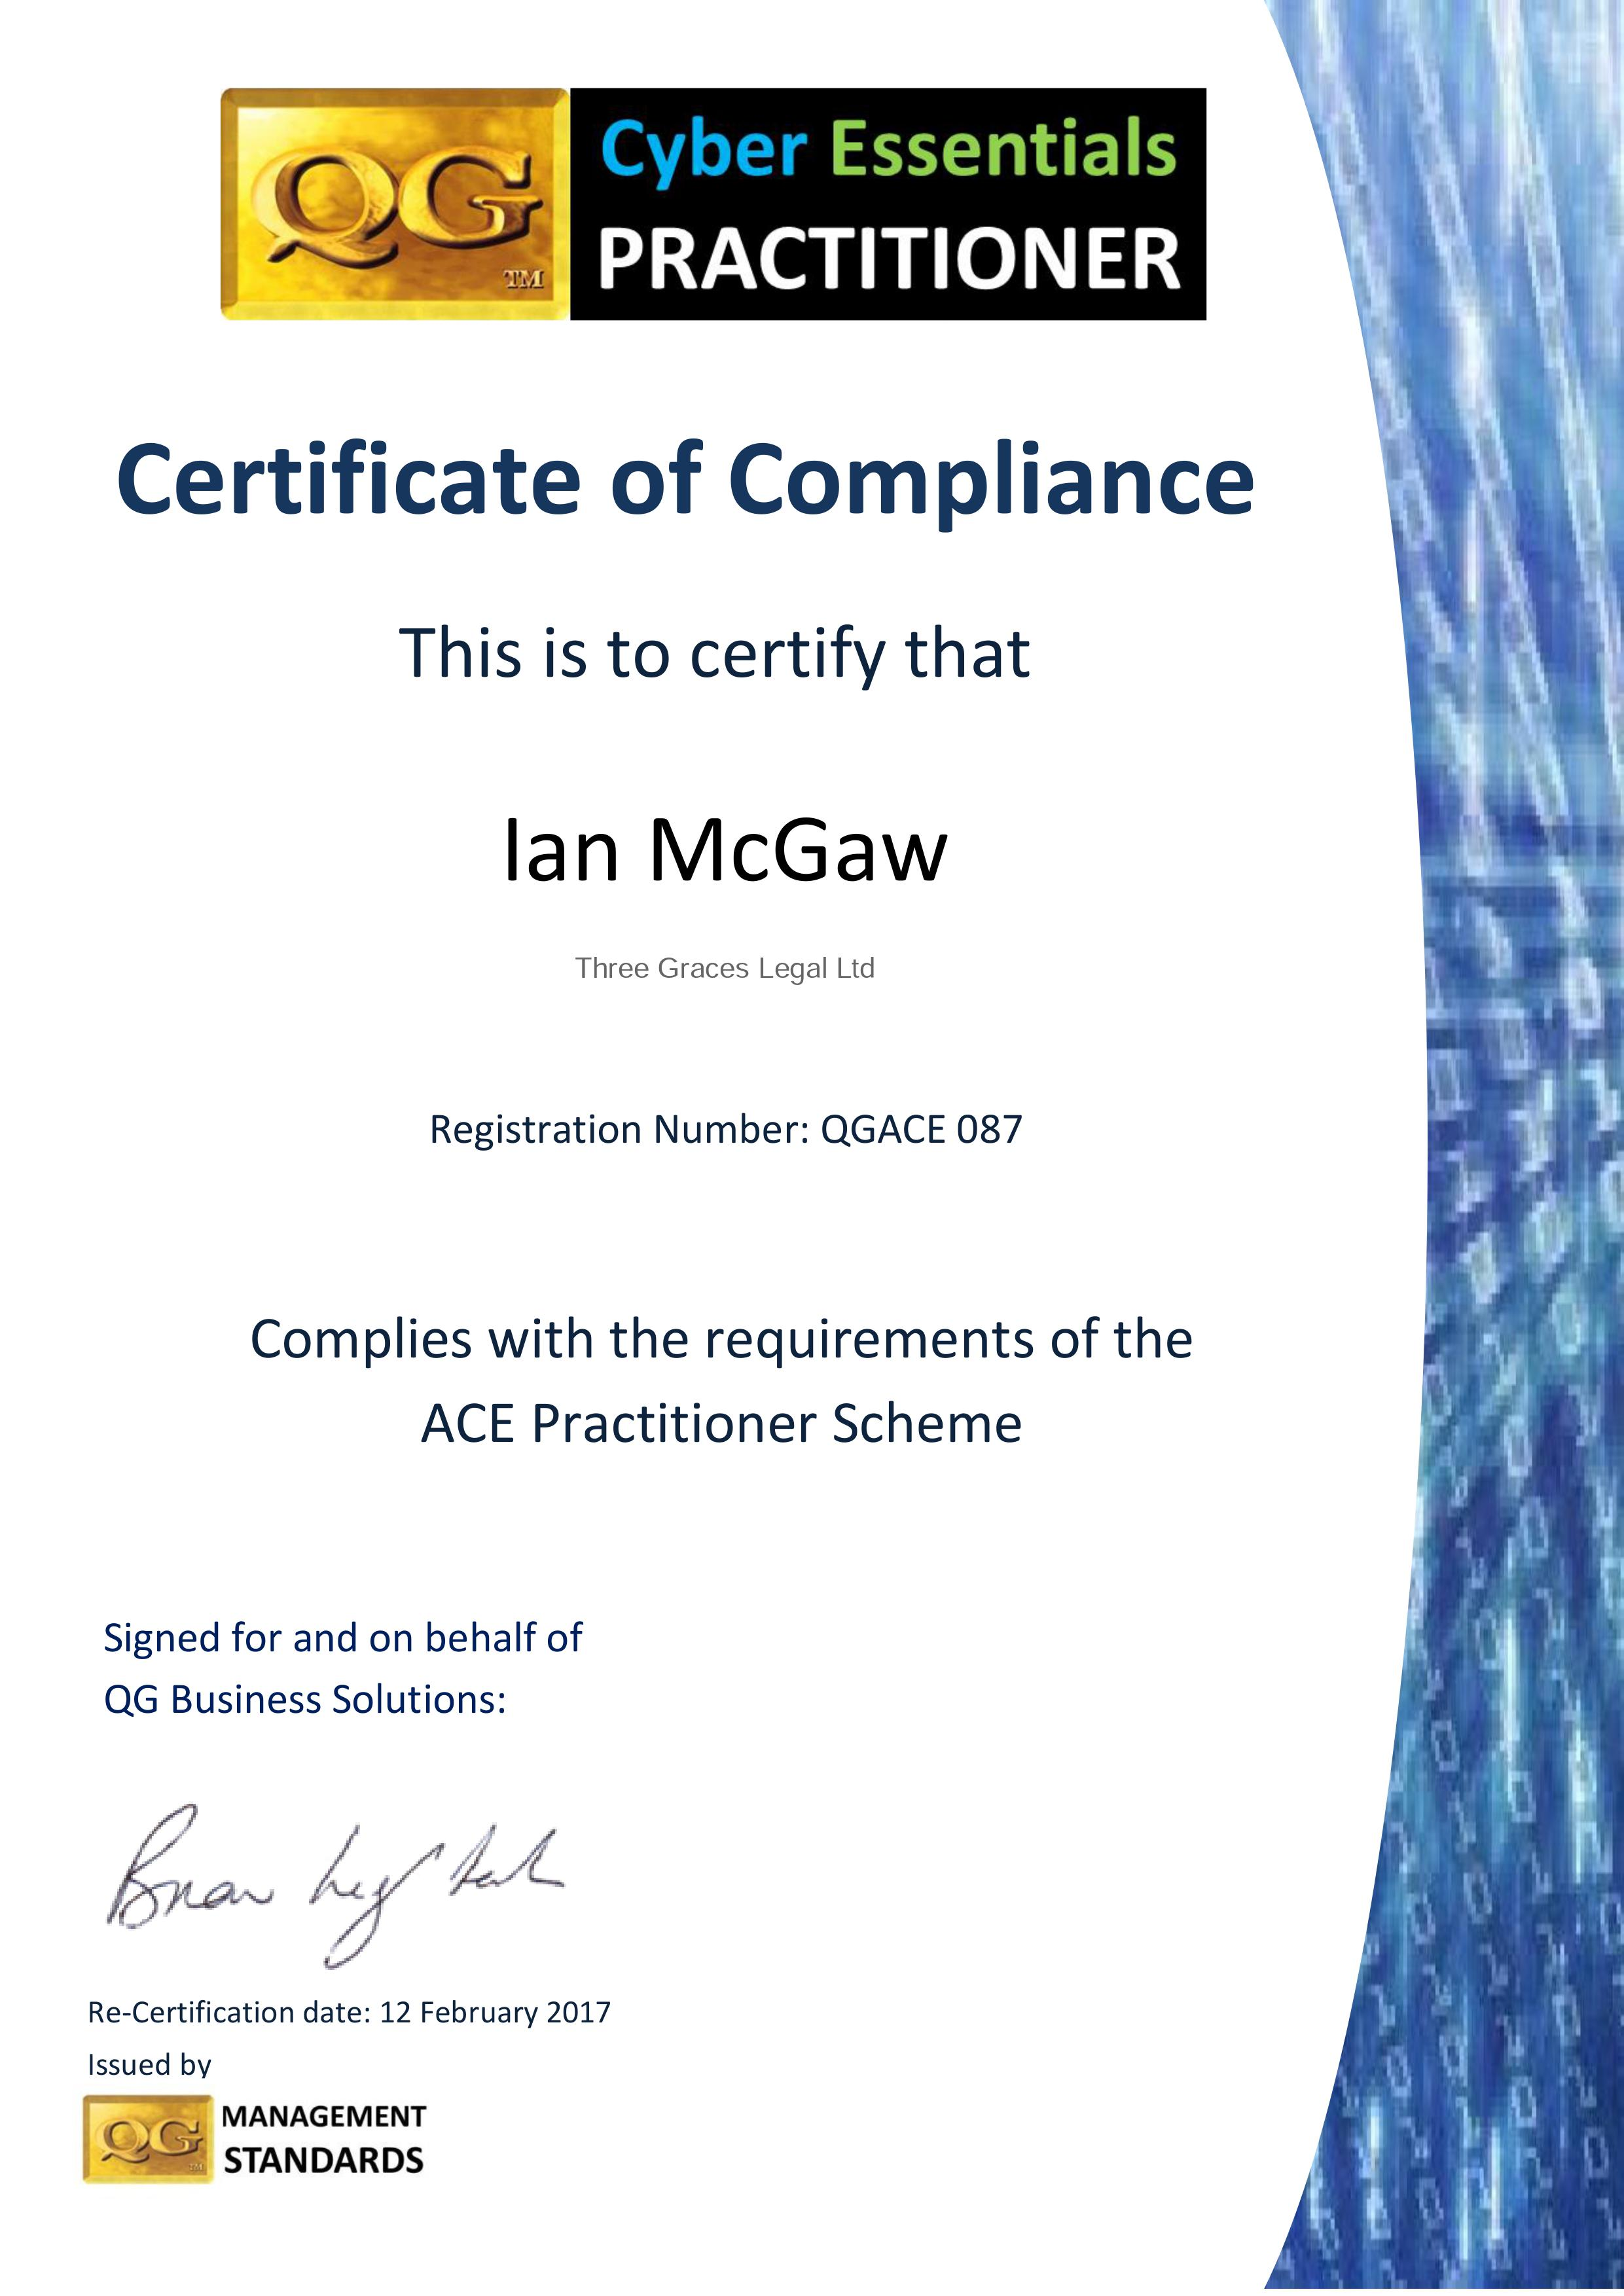 QGACE087 Ian